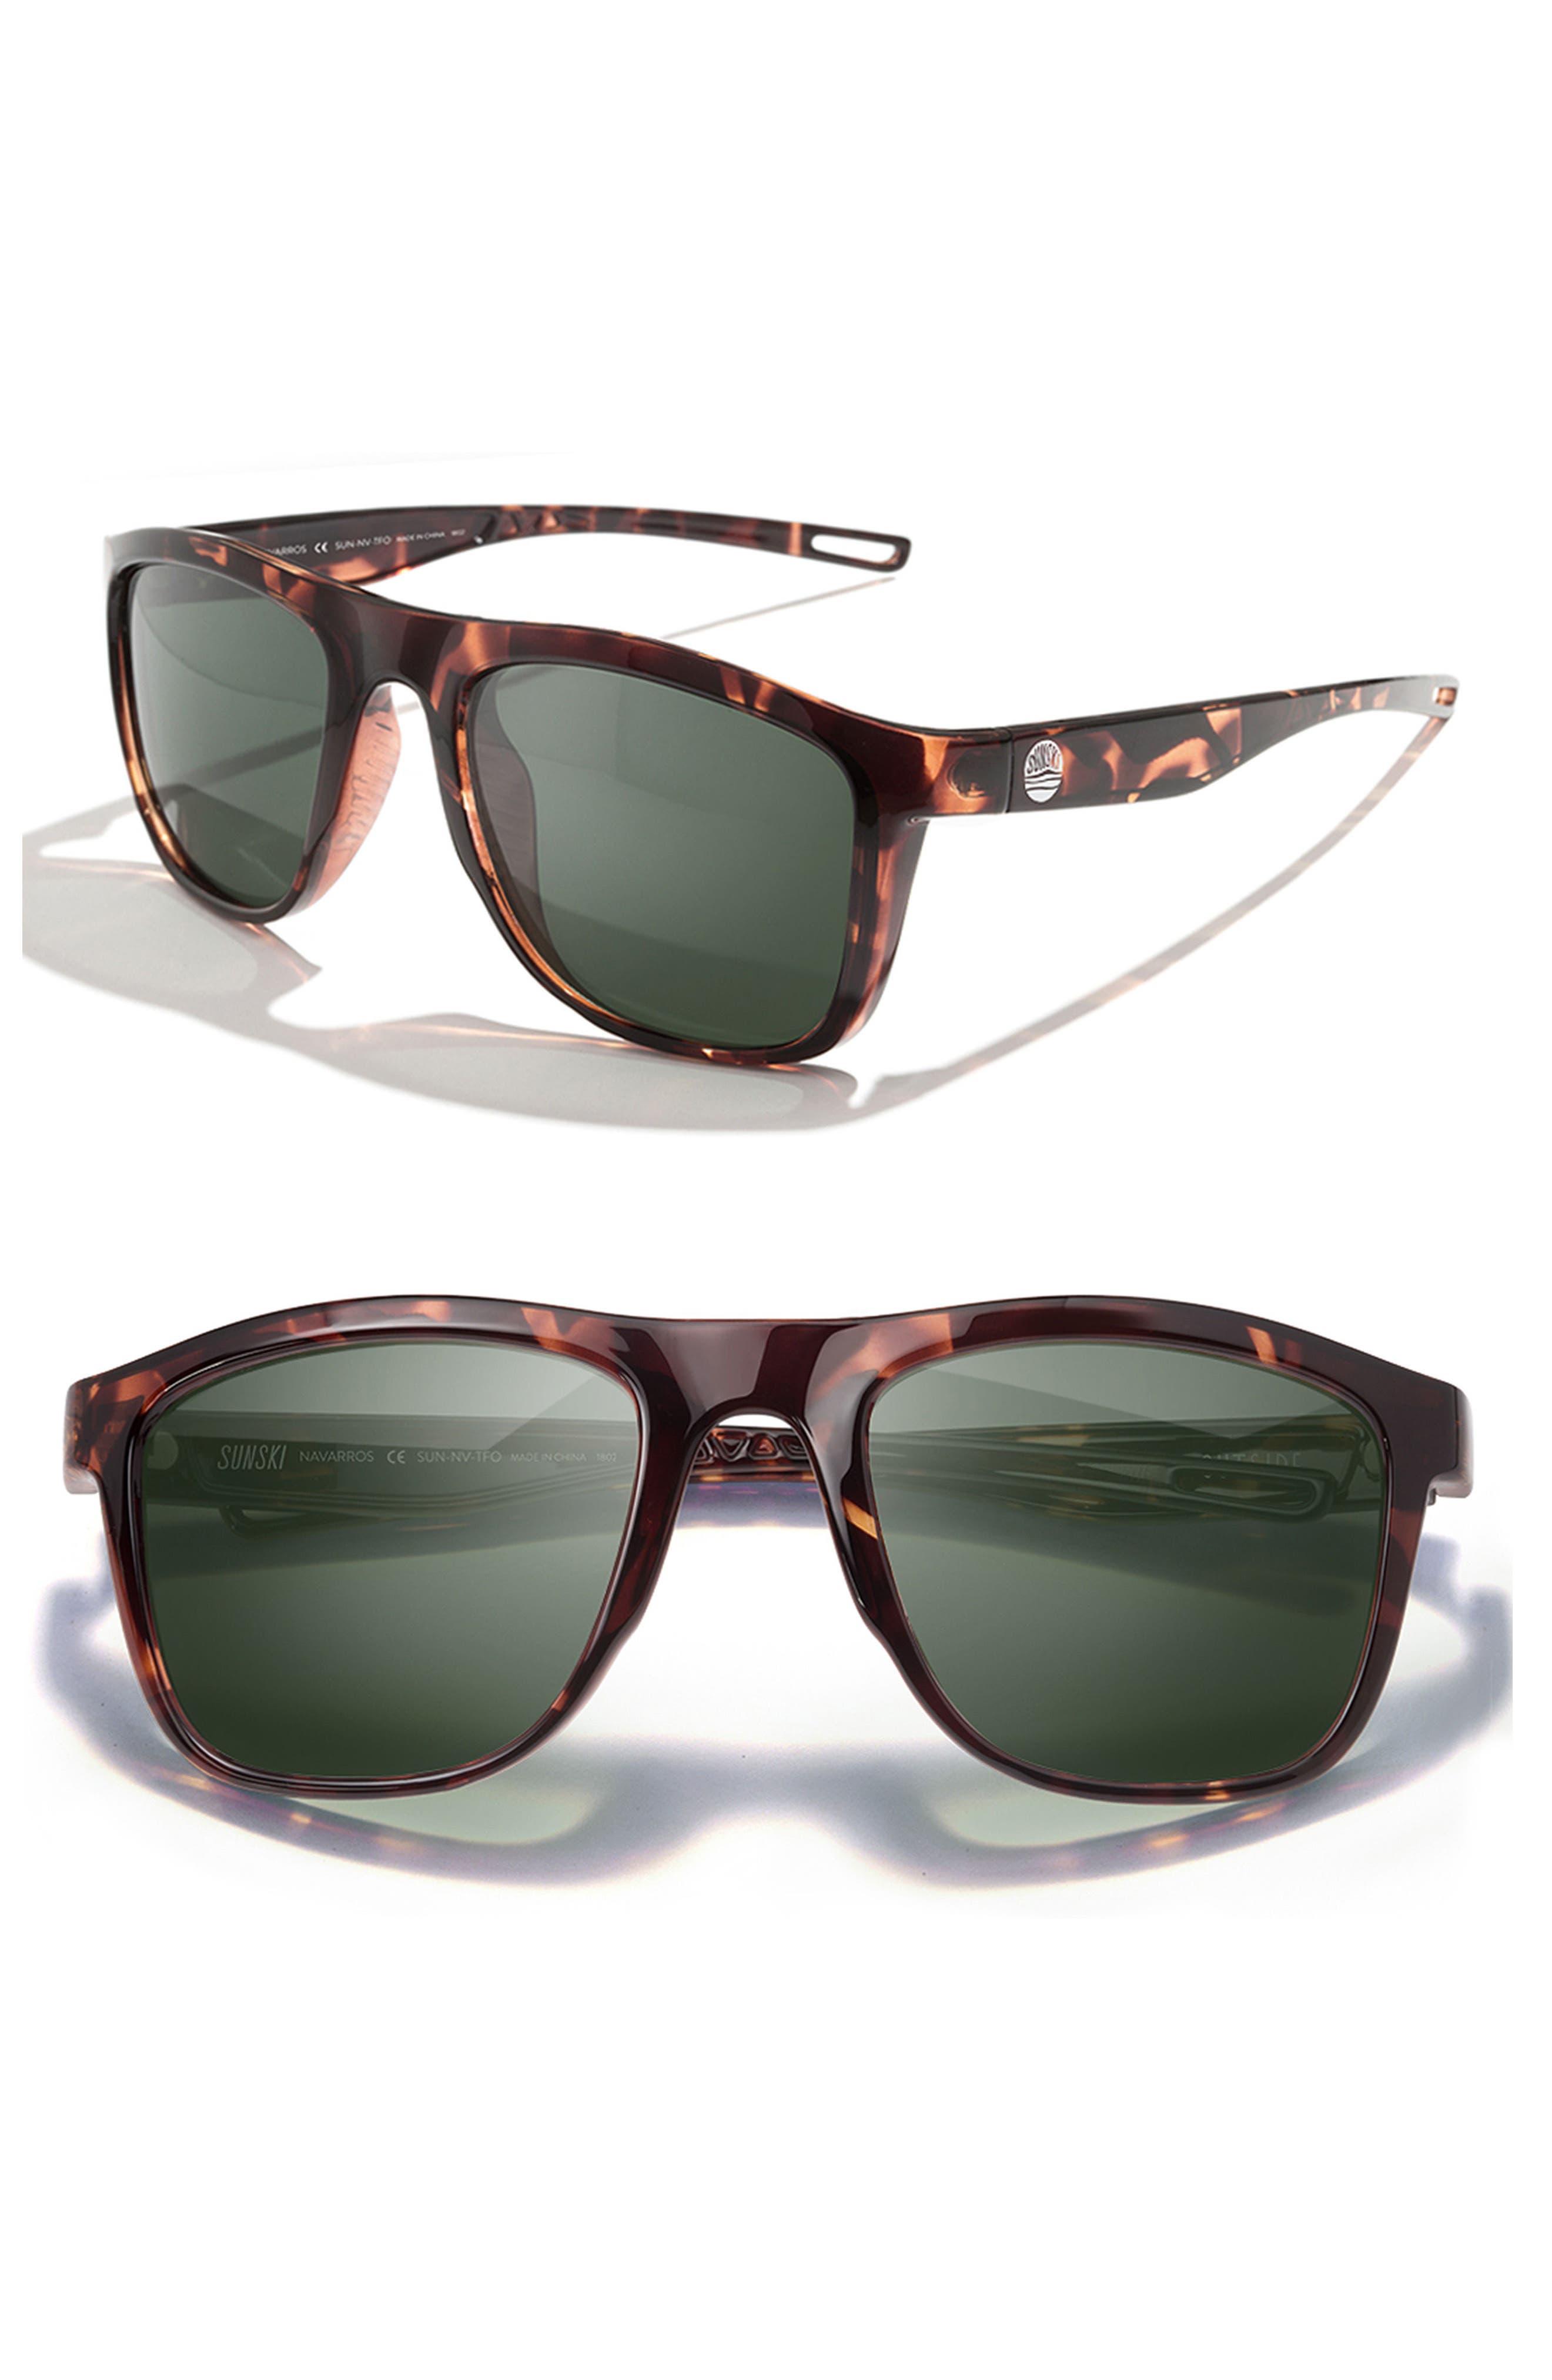 Navarros 53mm Polarized Sunglasses,                             Main thumbnail 1, color,                             TORTOISE FOREST